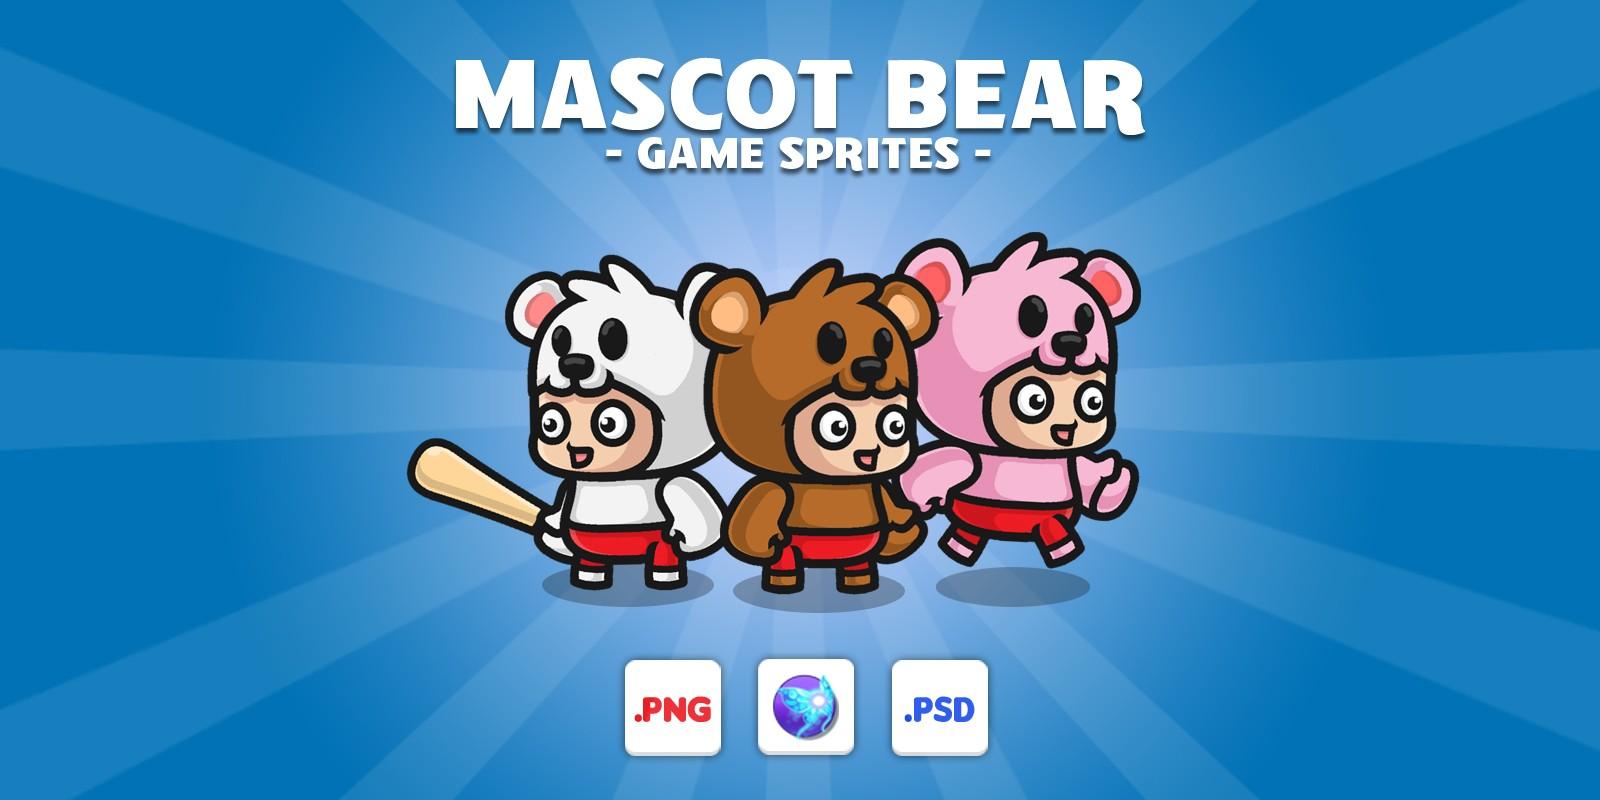 Mascot Bear Game Sprites